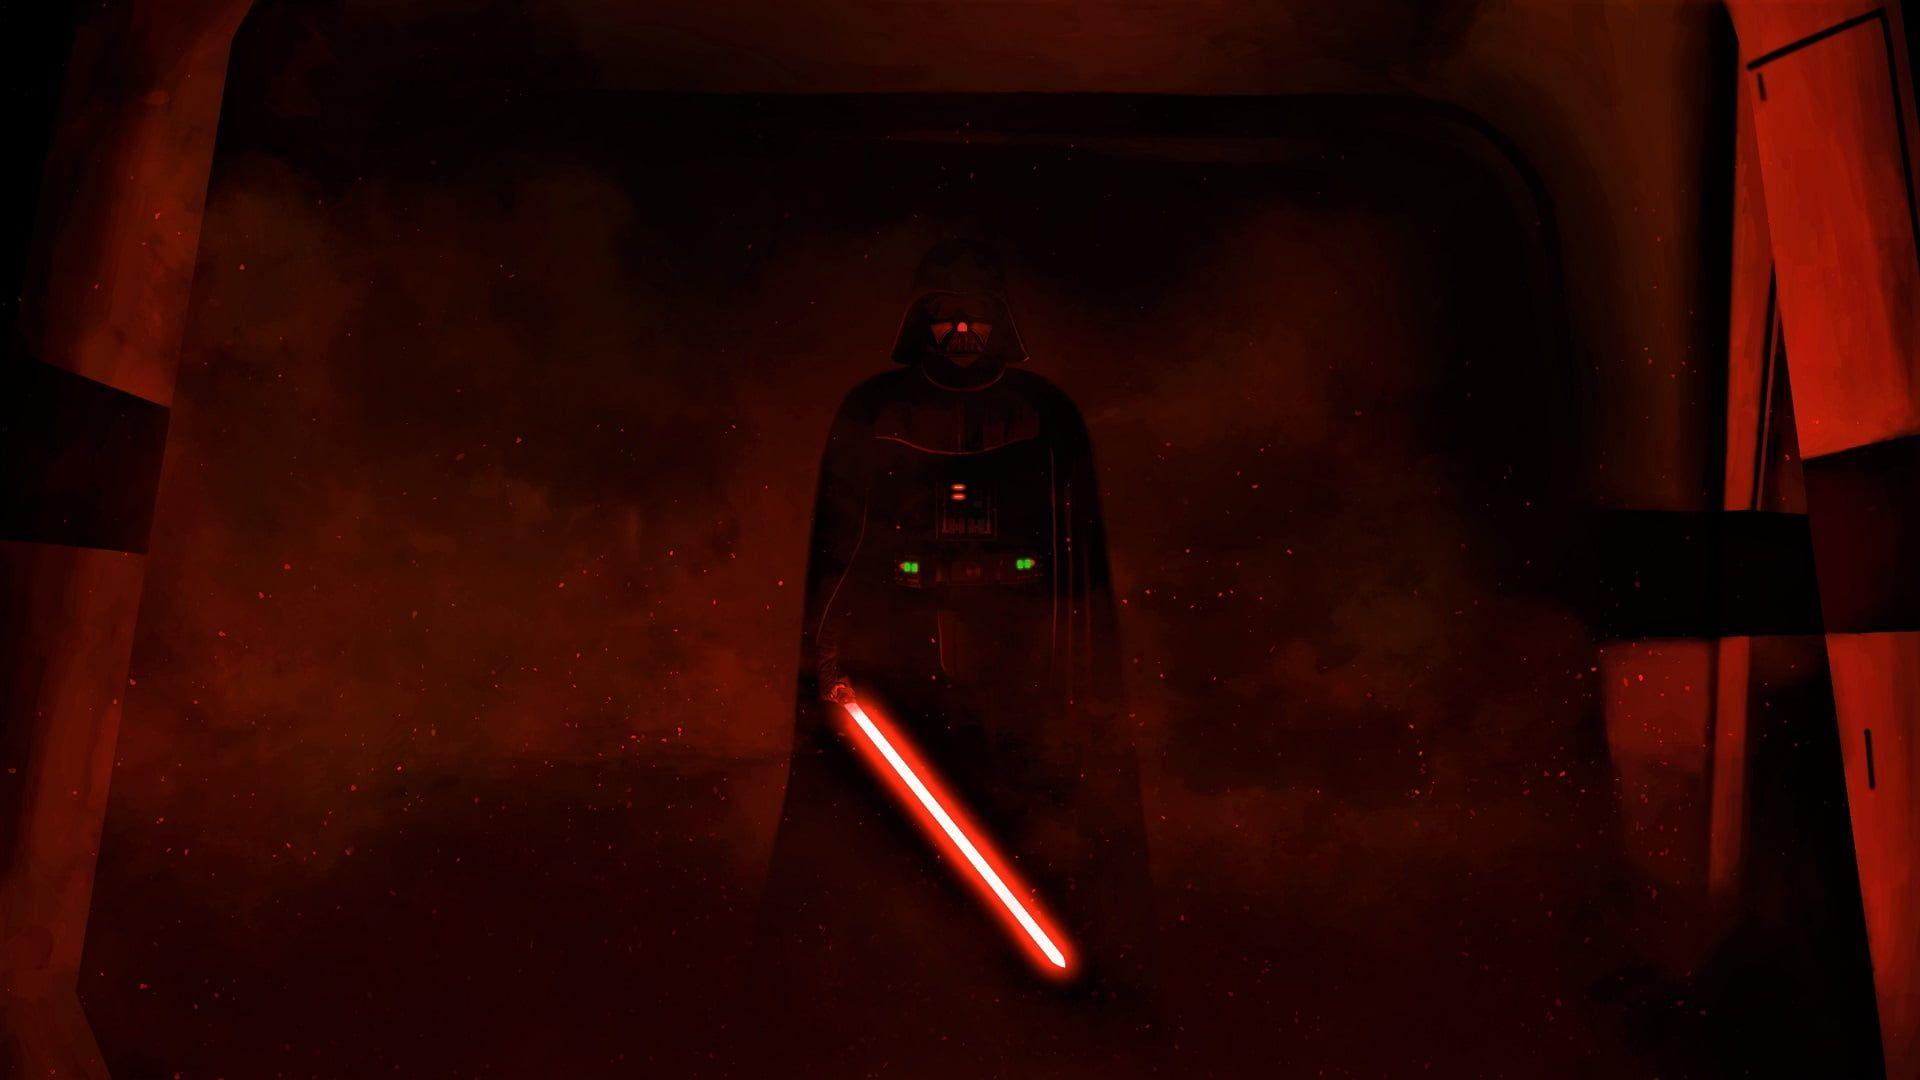 Star Wars Kylo Ren Wallpaper Star Wars Darth Vader Artwork Lightsaber People 1080p Wallpaper In 2020 Star Wars Wallpaper Darth Vader Wallpaper Darth Vader Artwork